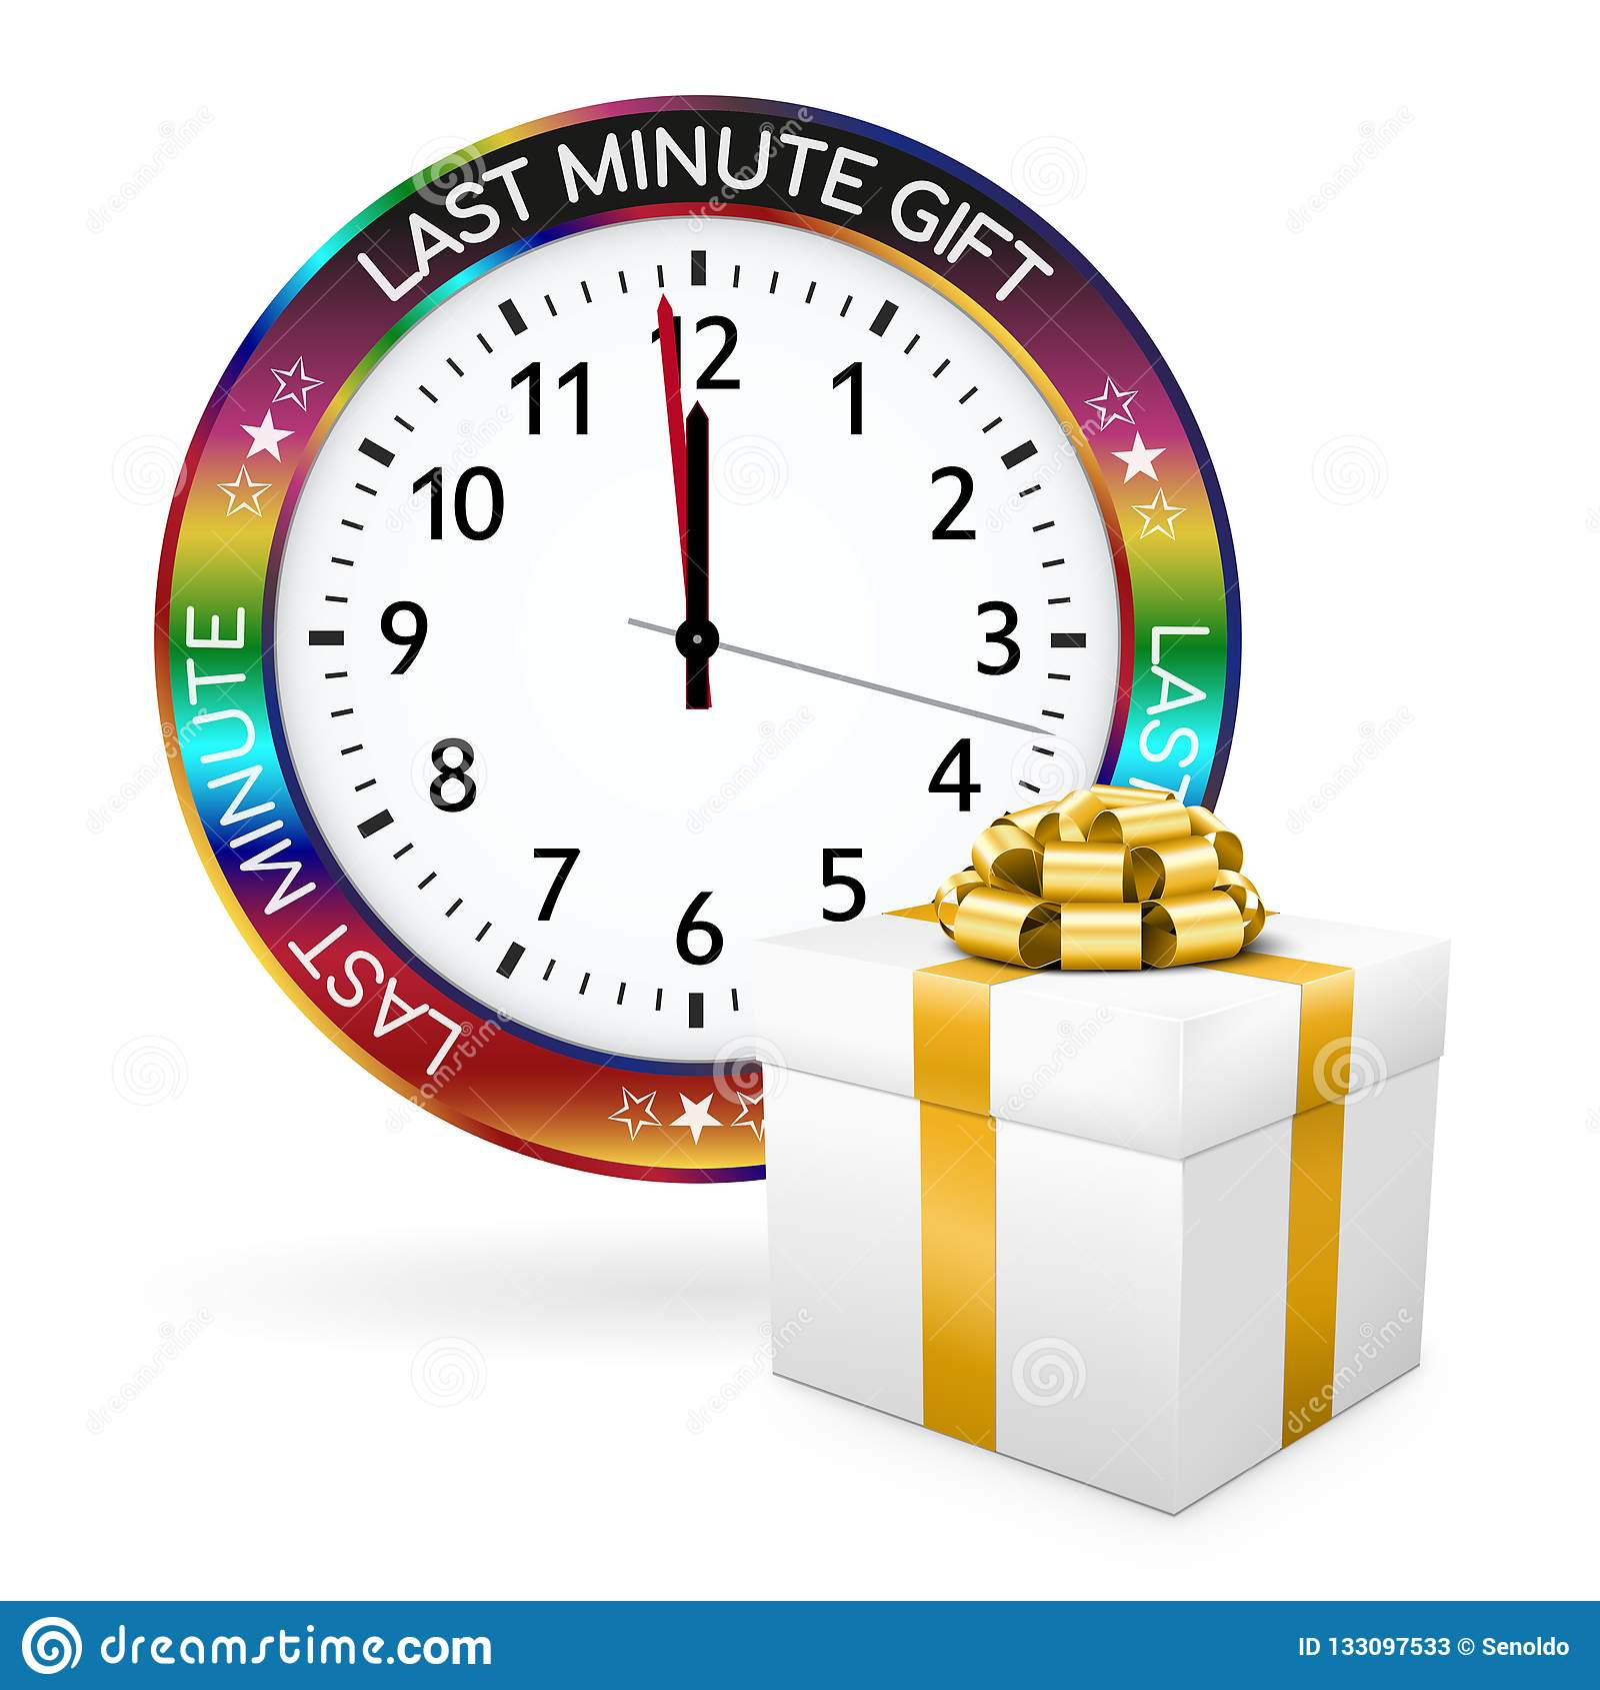 White Last Minute Present - Clock with Colorful Border